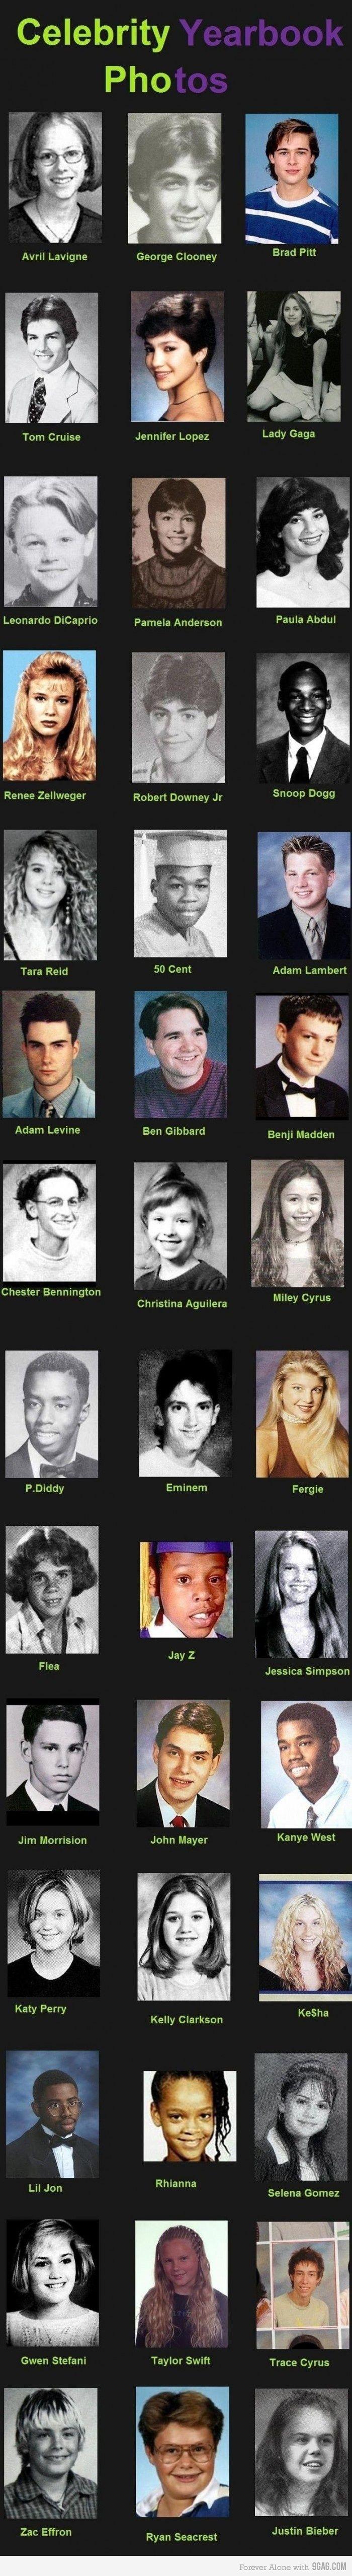 Yearbook Photos...